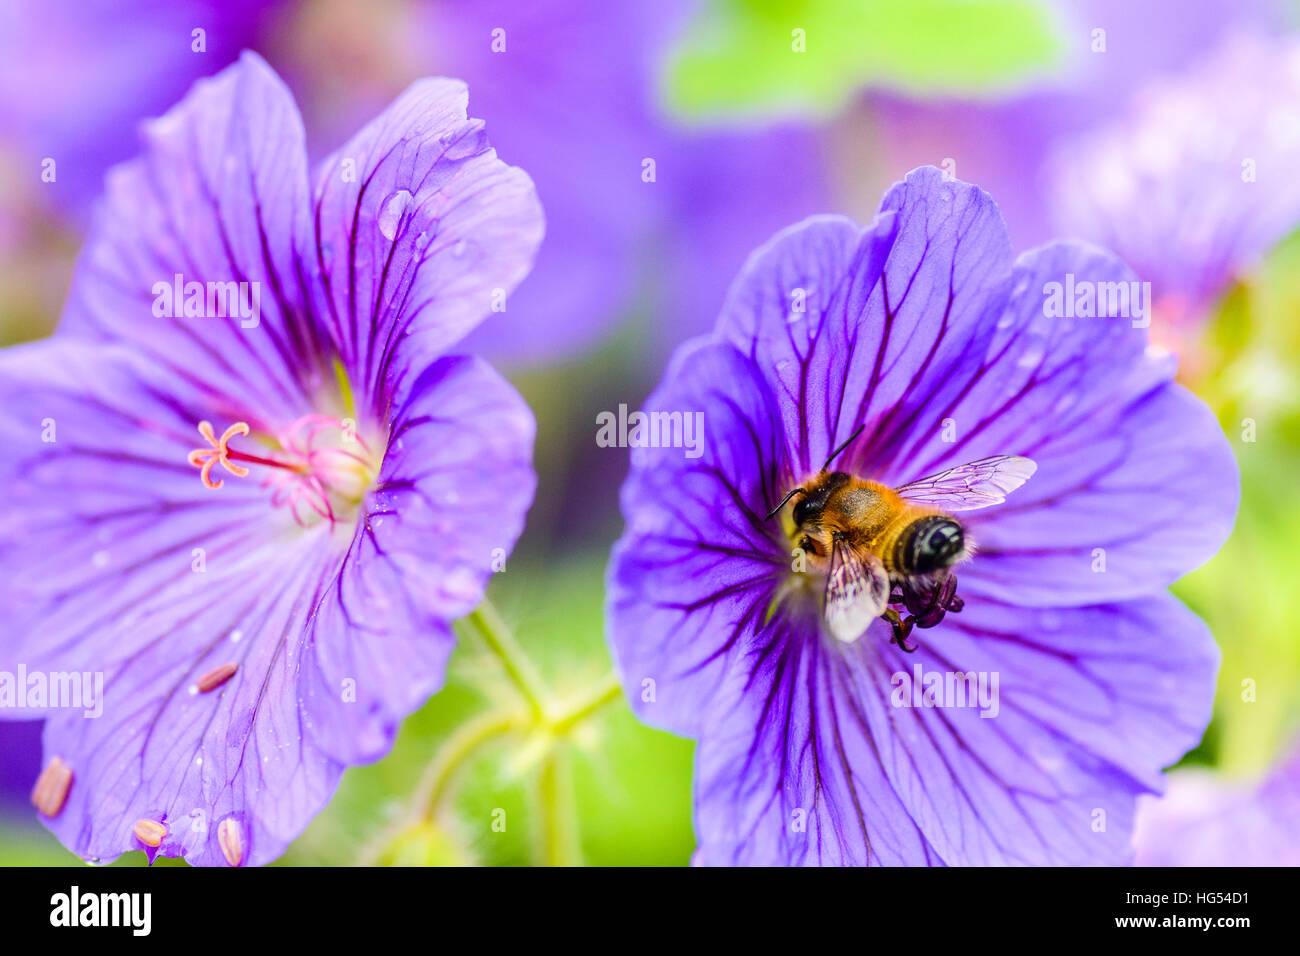 Honey-bee (Apis mellifera) on meadow cranesbill (Geranium pratense) flower Edinburgh Scotland Stock Photo